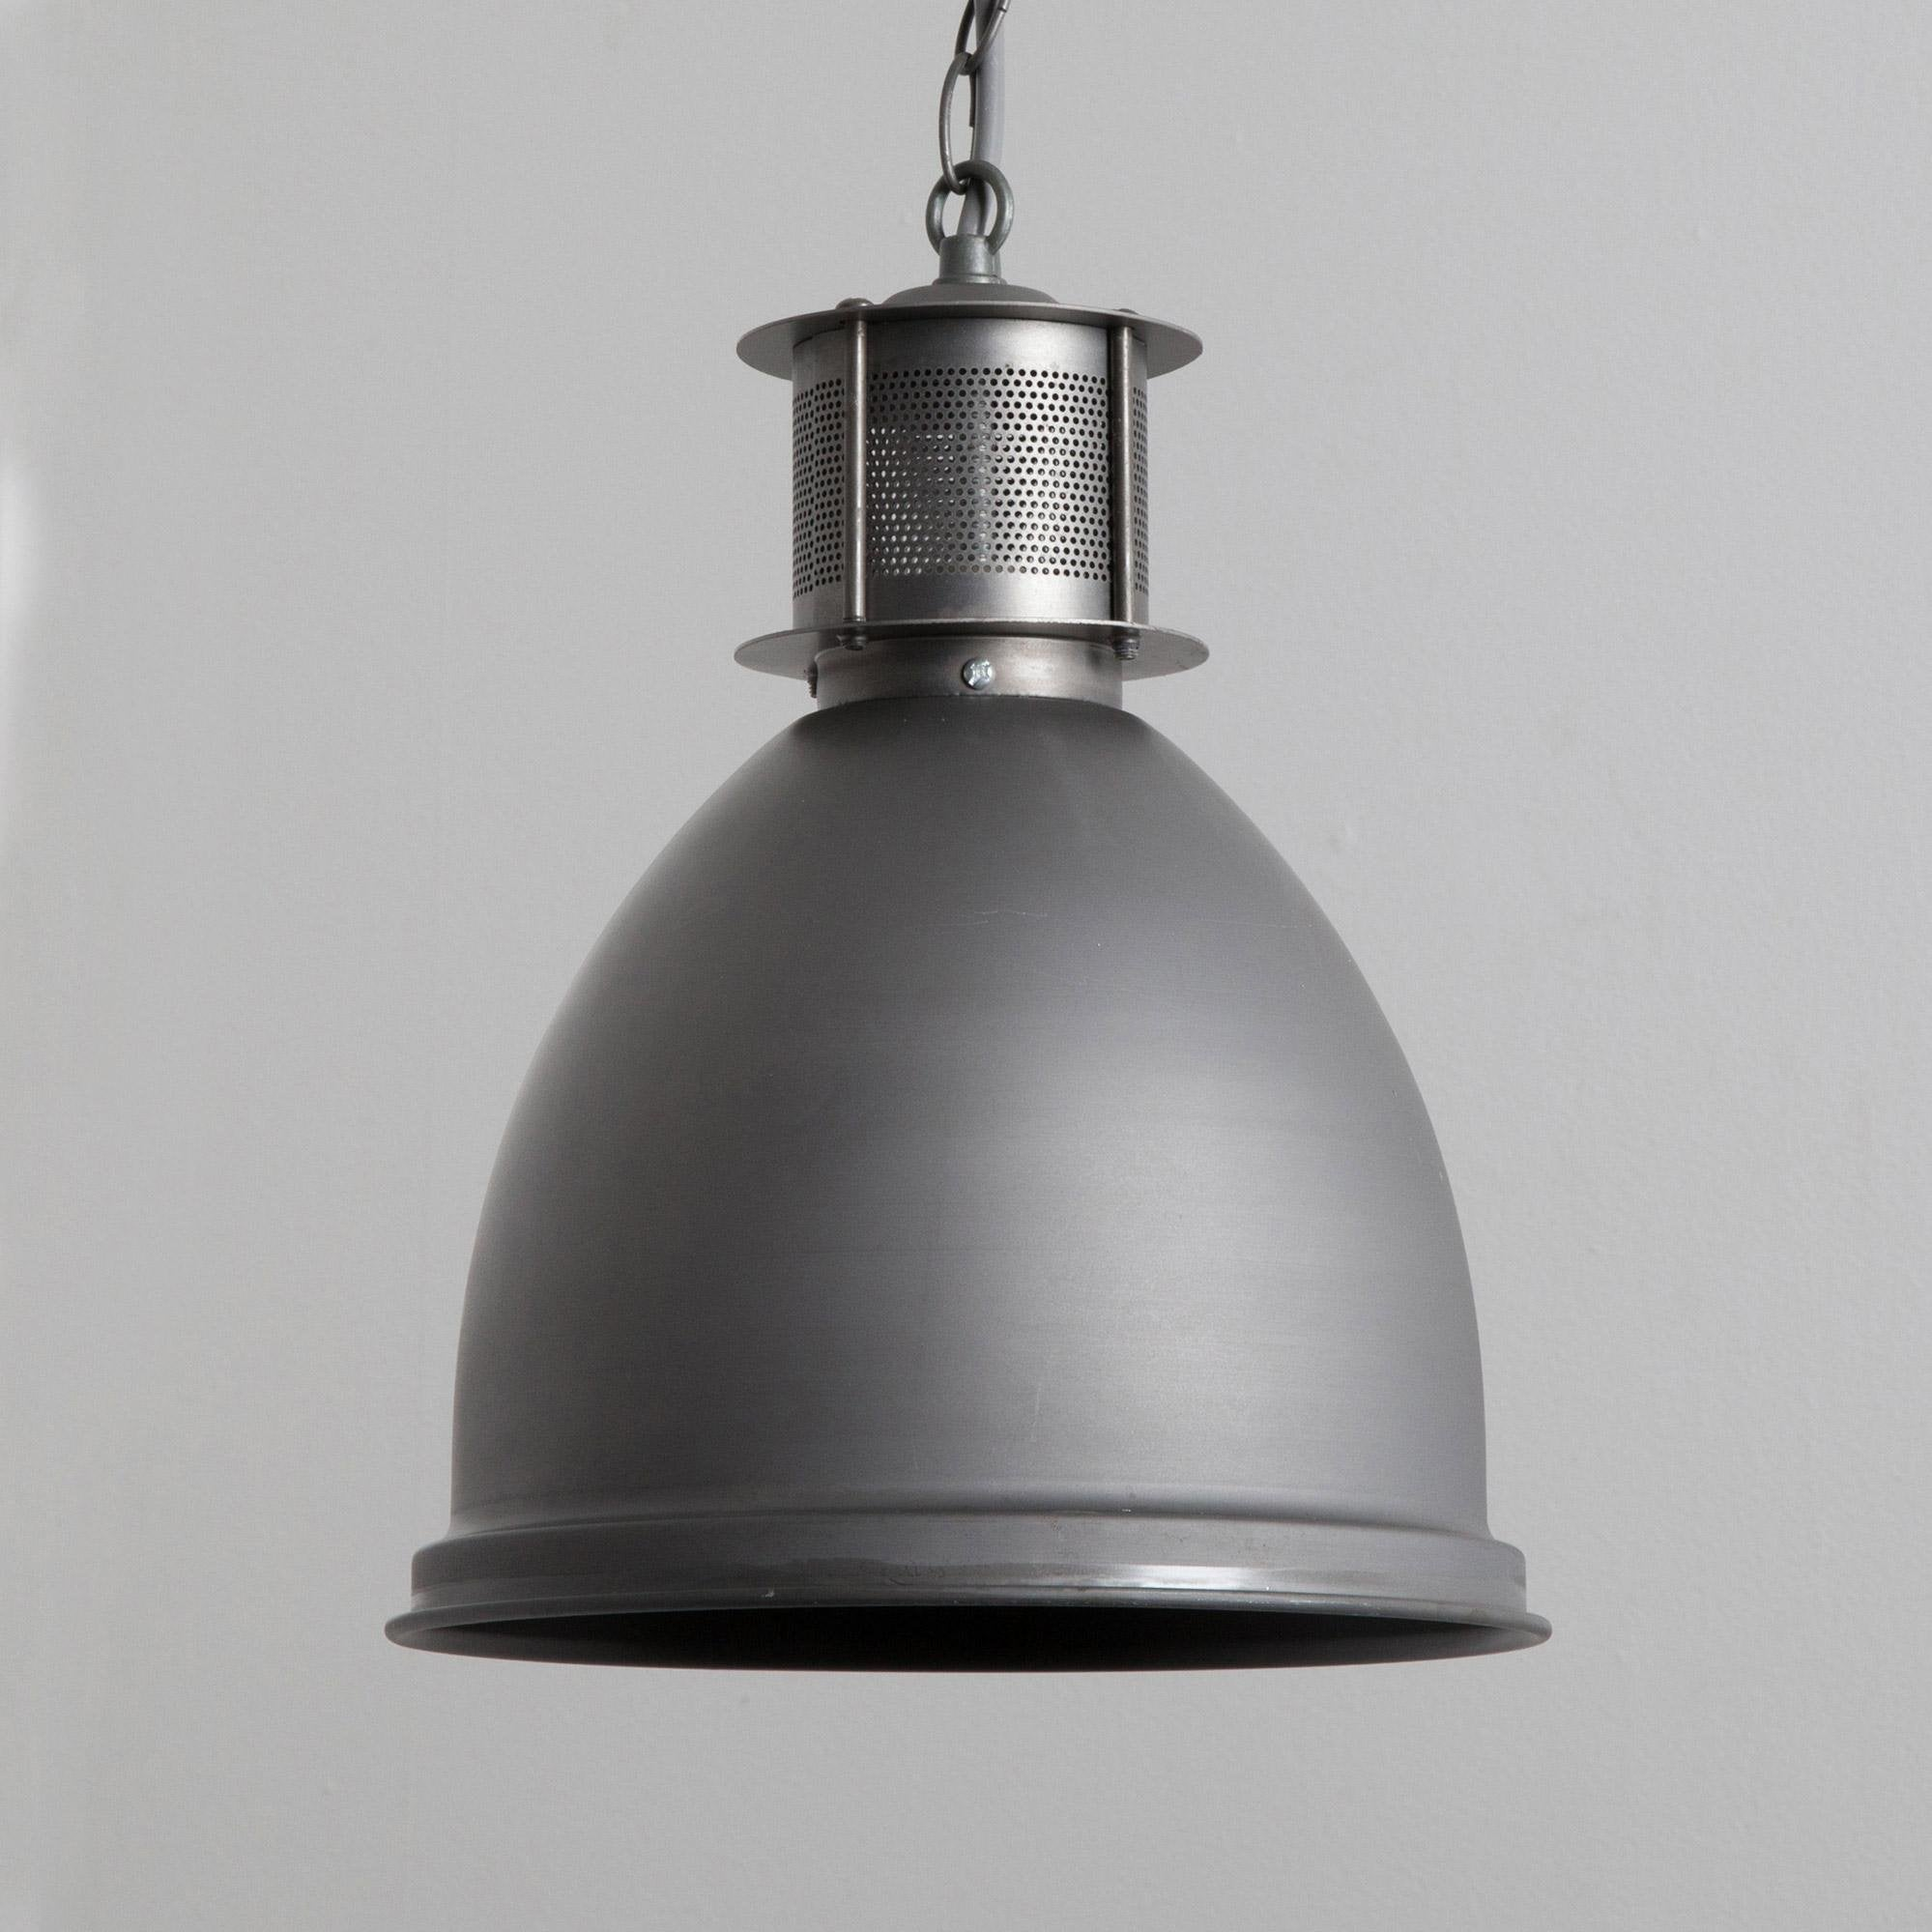 Suspension, e27 design Raina métal acier brossé 1 x 60 W INSPIRE